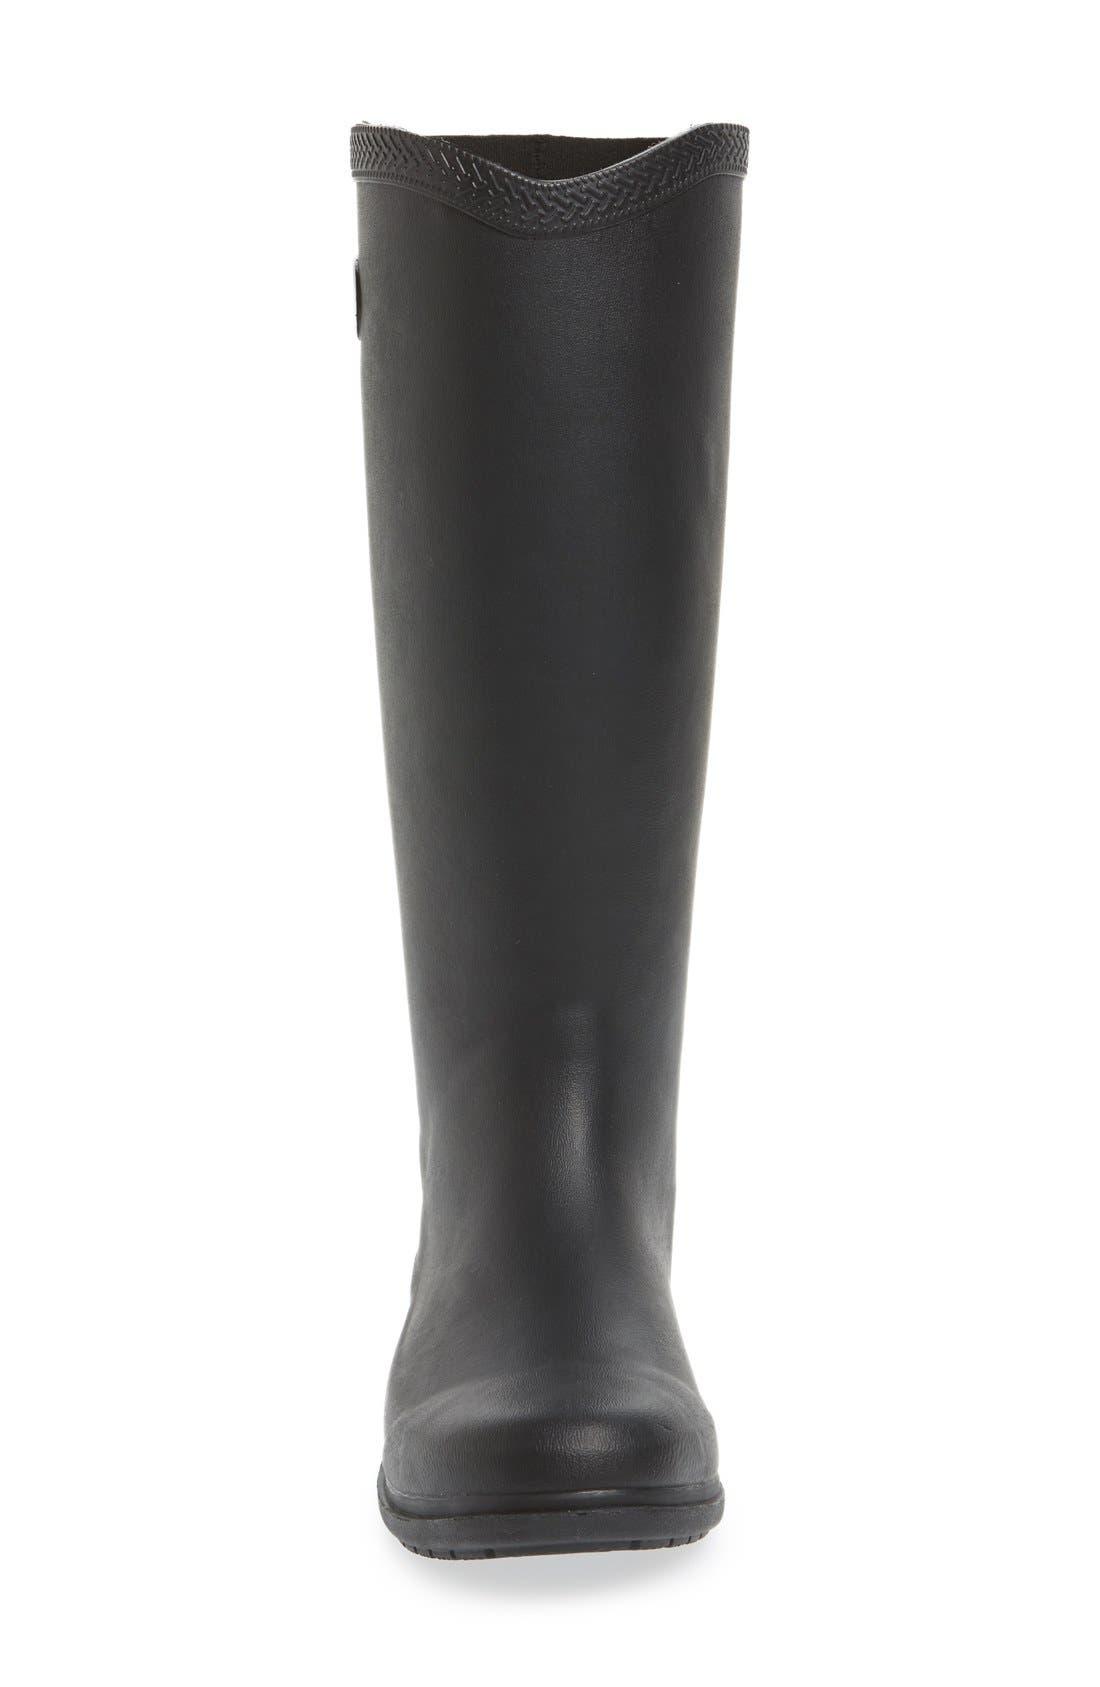 Alternate Image 3  - Havaianas 'Galochas Hi Matte' Waterproof Rain Boot (Women) (Wide Calf)